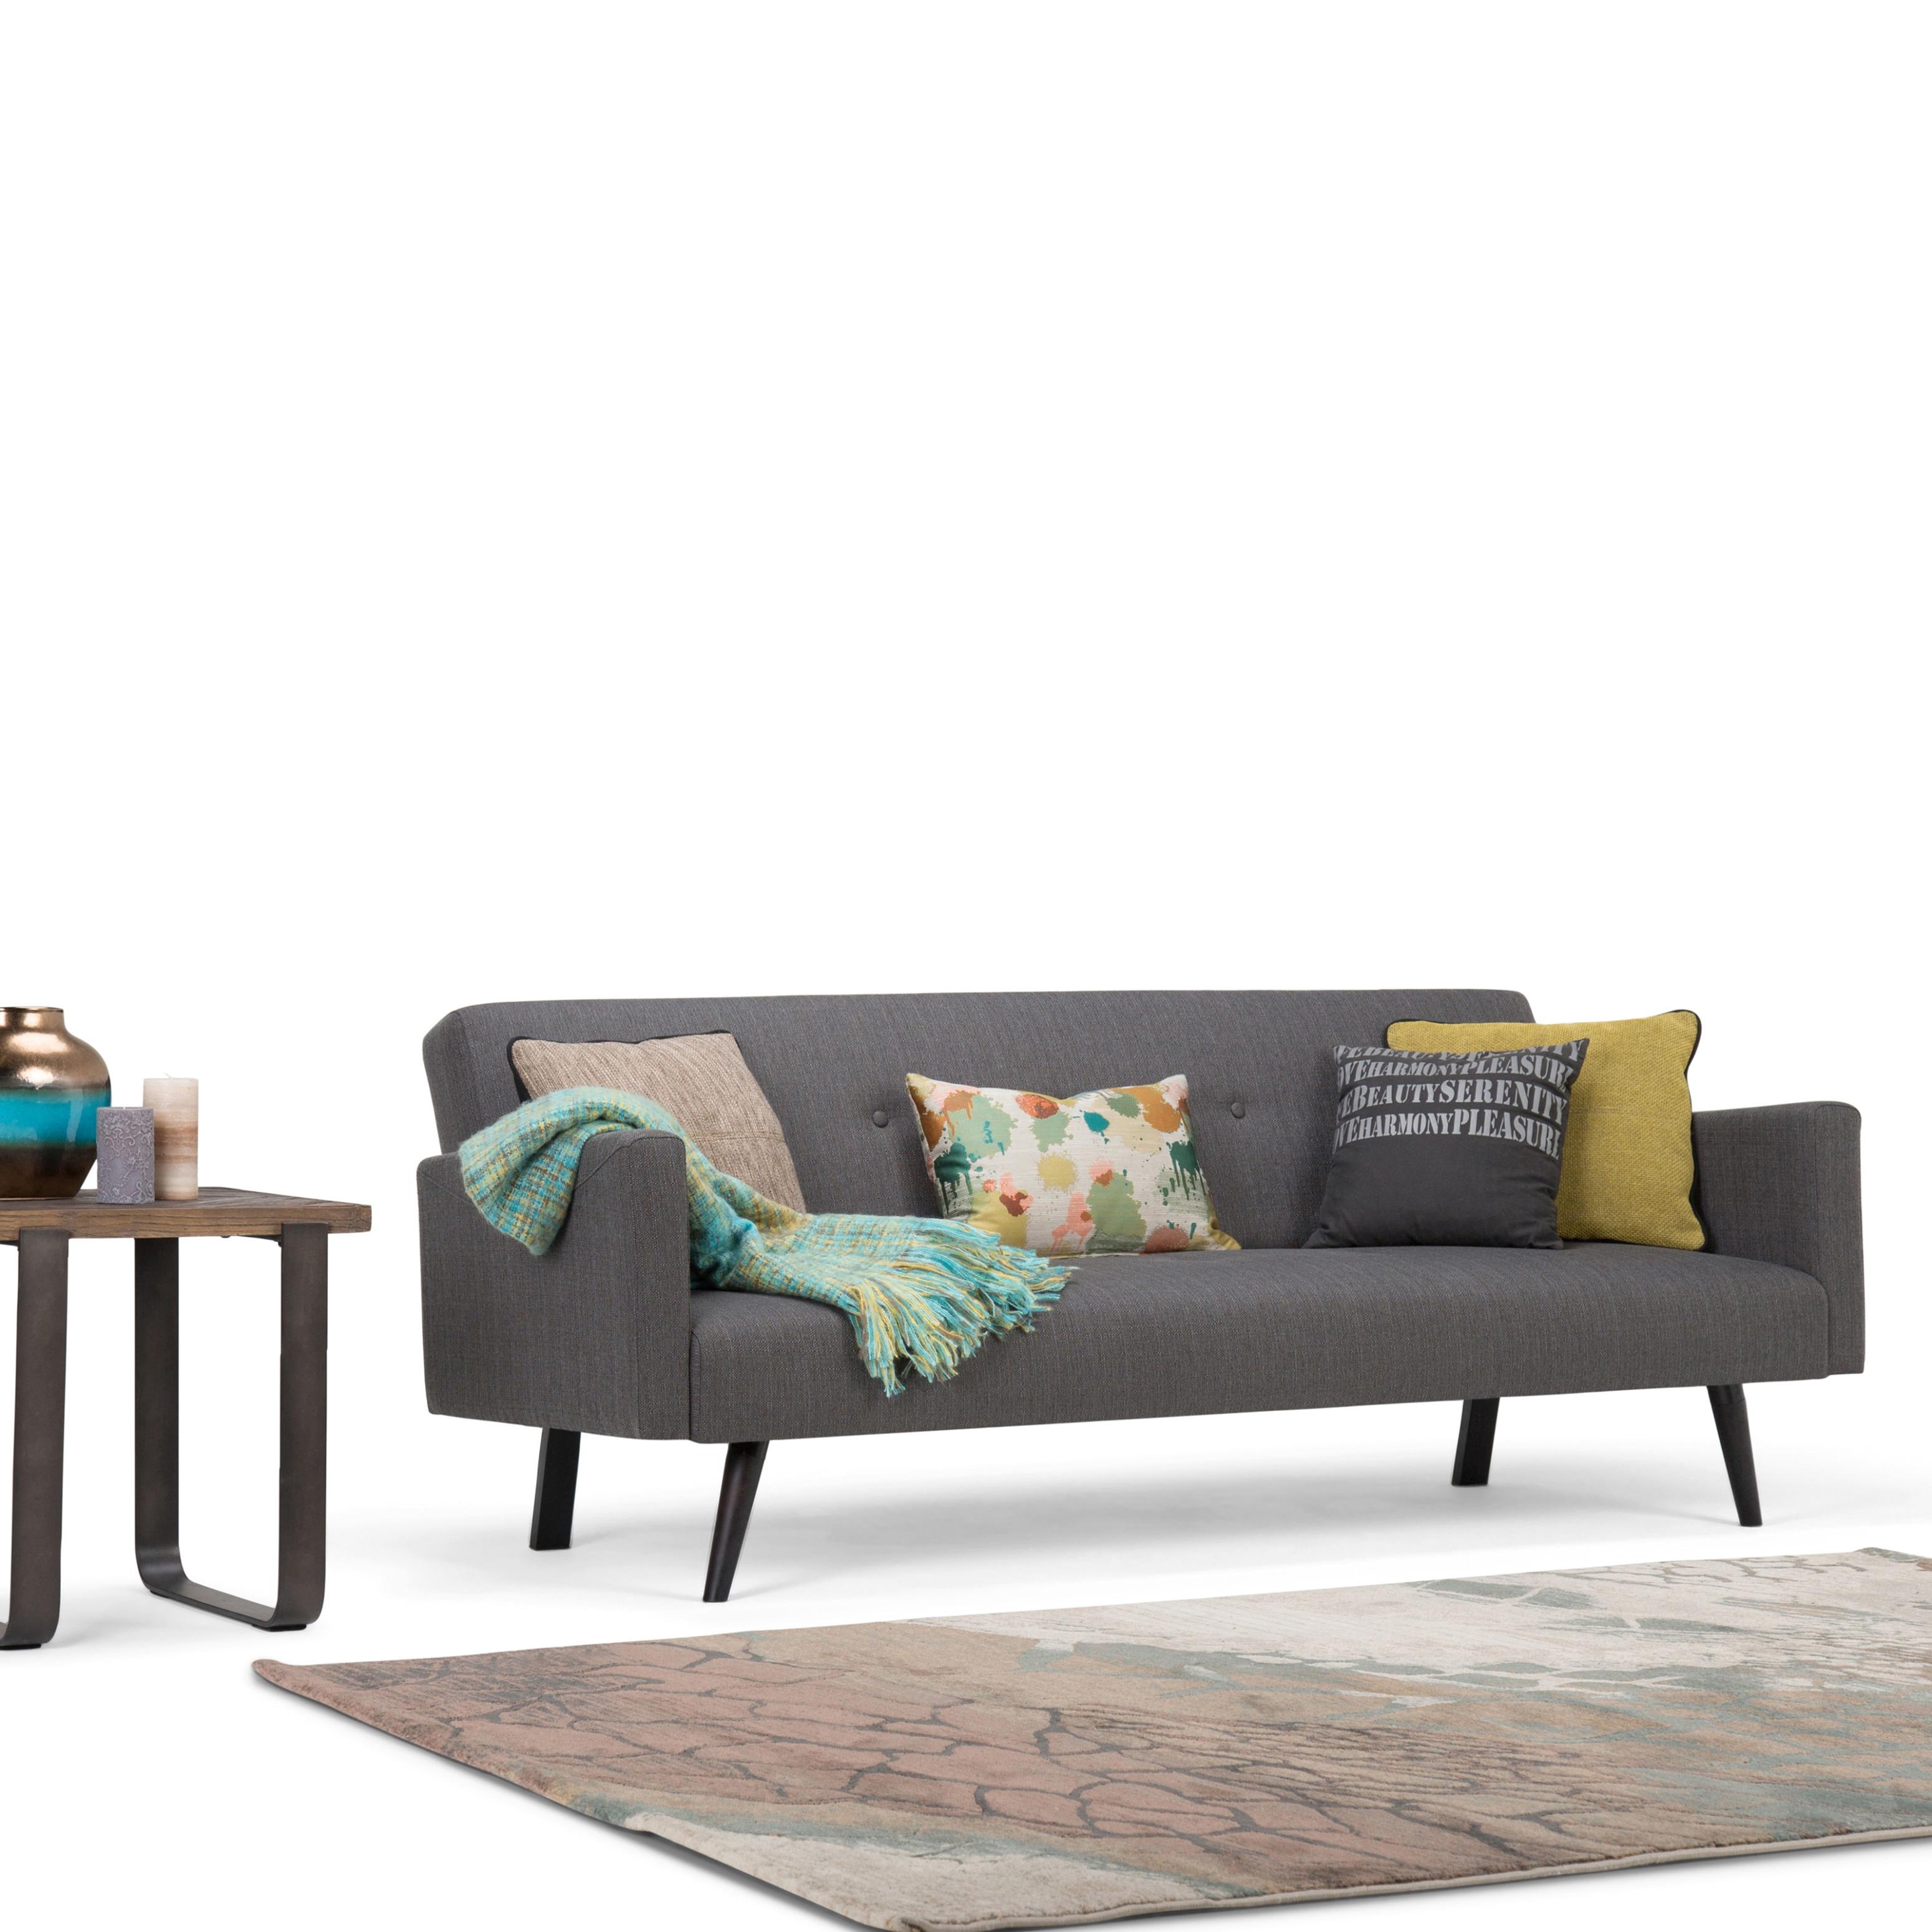 Shop wyndenhall trevor sofa bed free shipping today overstock com 16326620